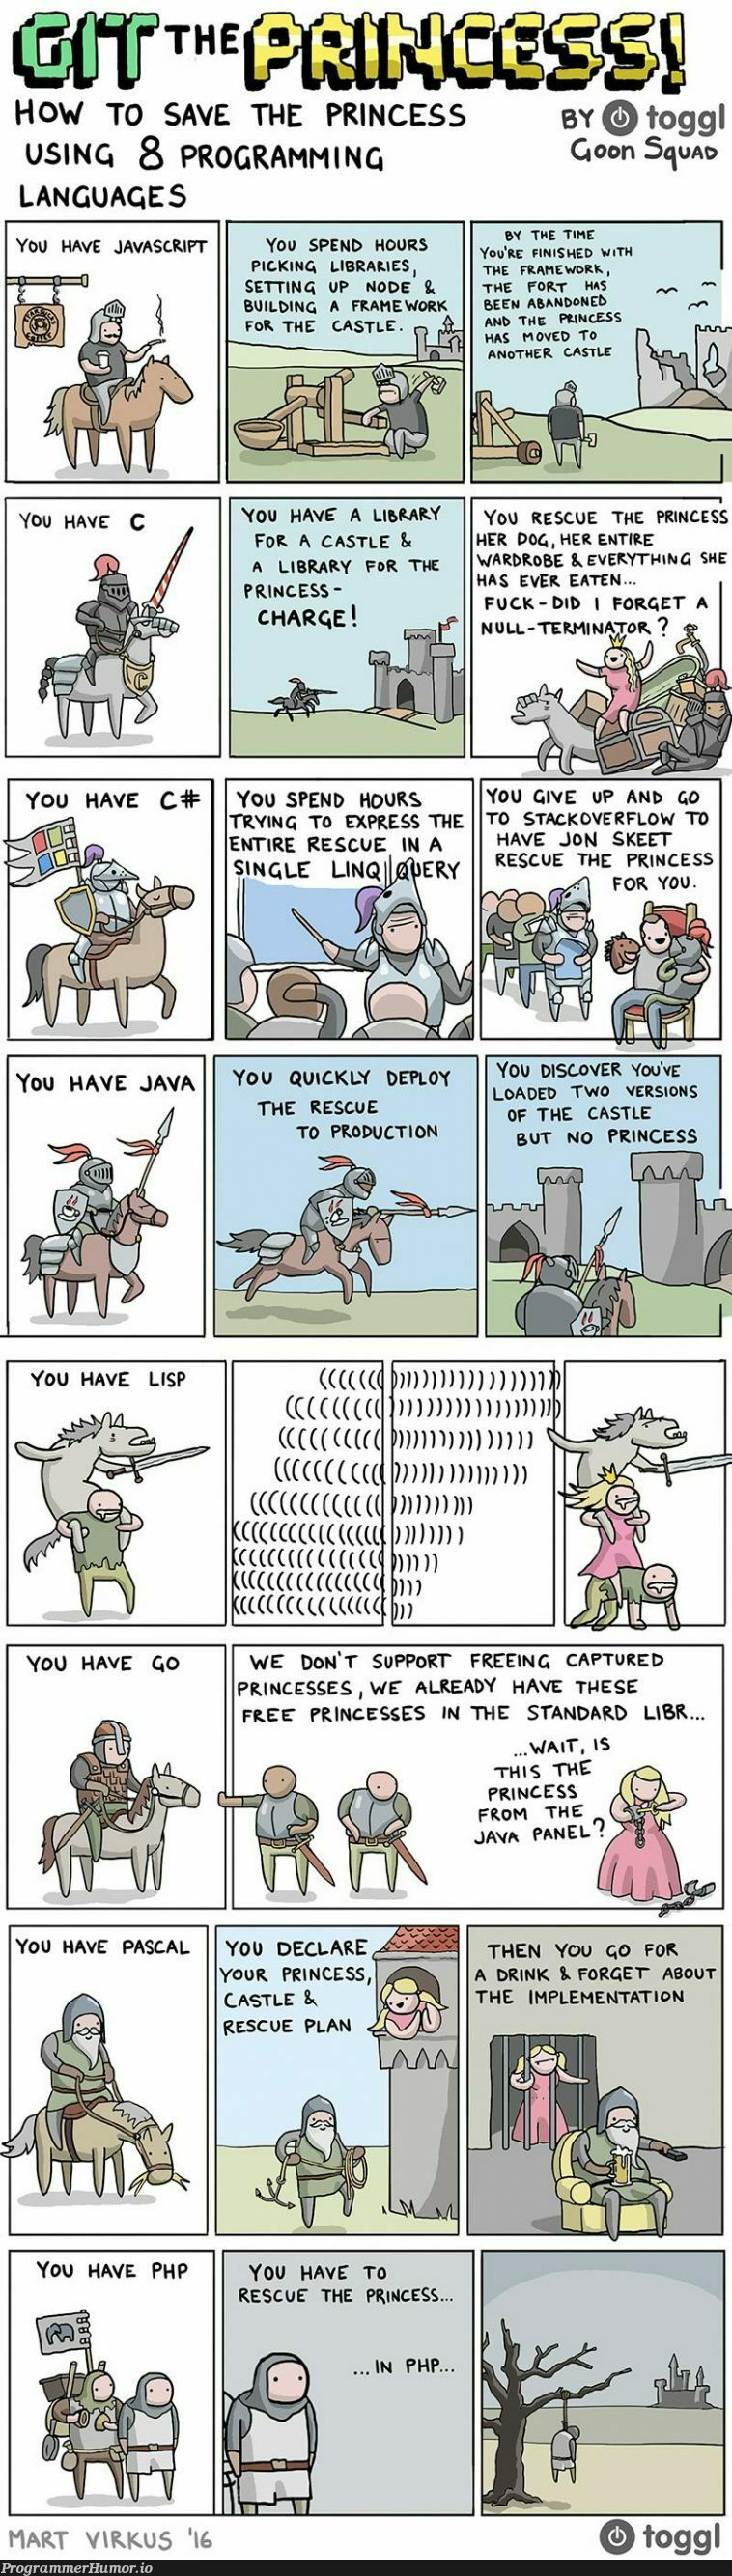 How to save the princess using 8 programming languages | programming-memes, javascript-memes, java-memes, program-memes, node-memes, version-memes, production-memes, language-memes, framework-memes, product-memes, programming language-memes | ProgrammerHumor.io